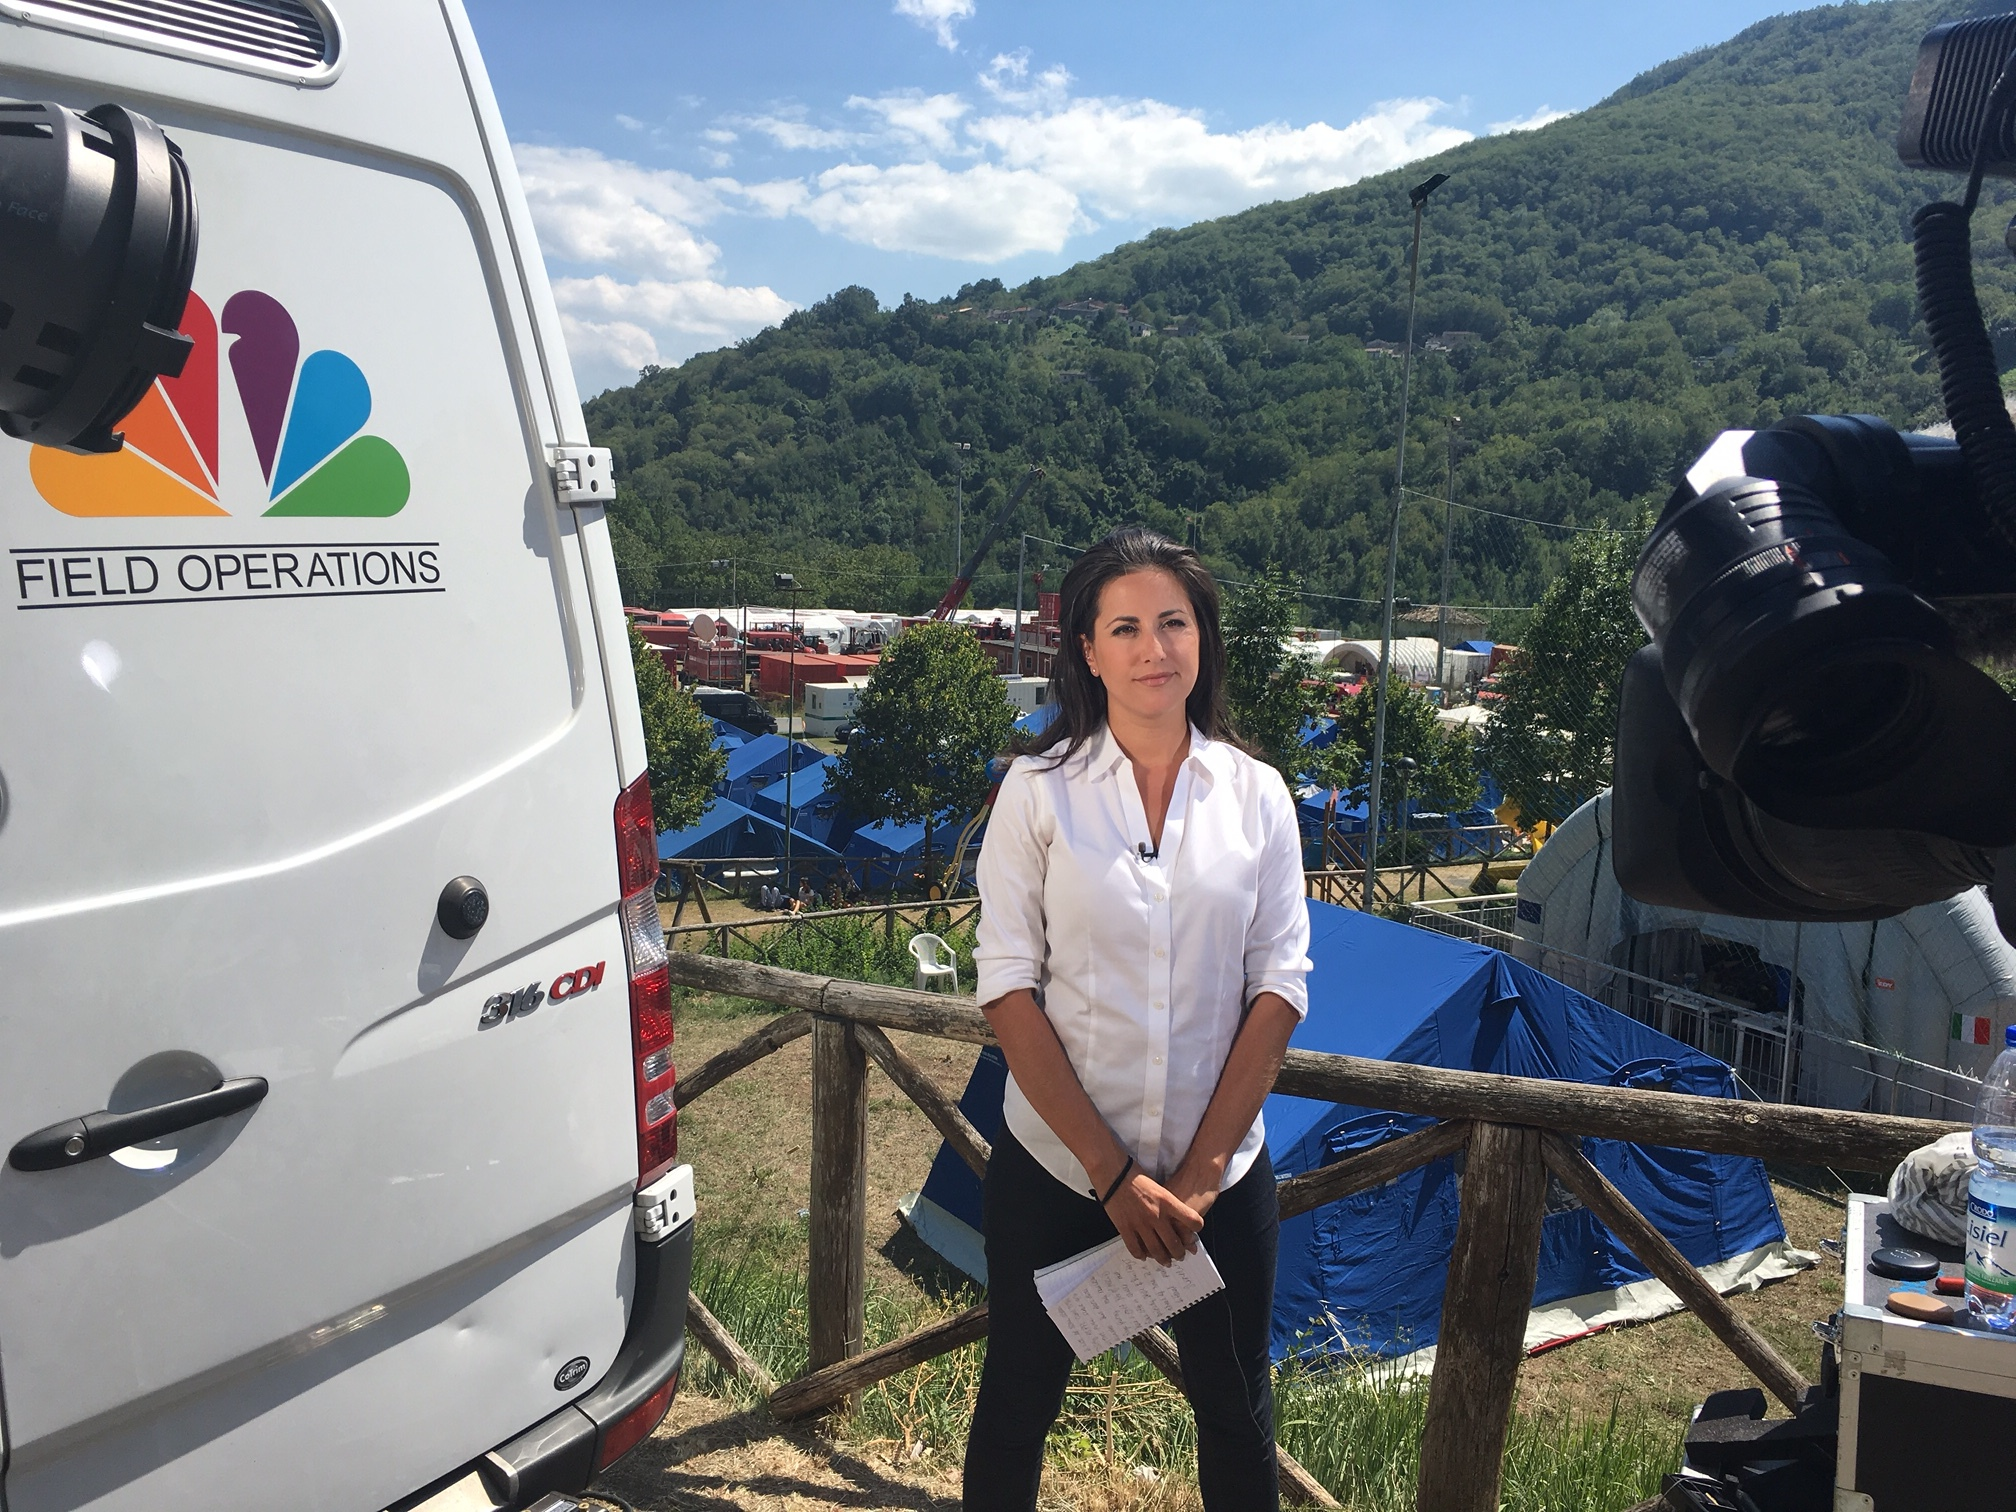 Lucy Kafanov, NBC News